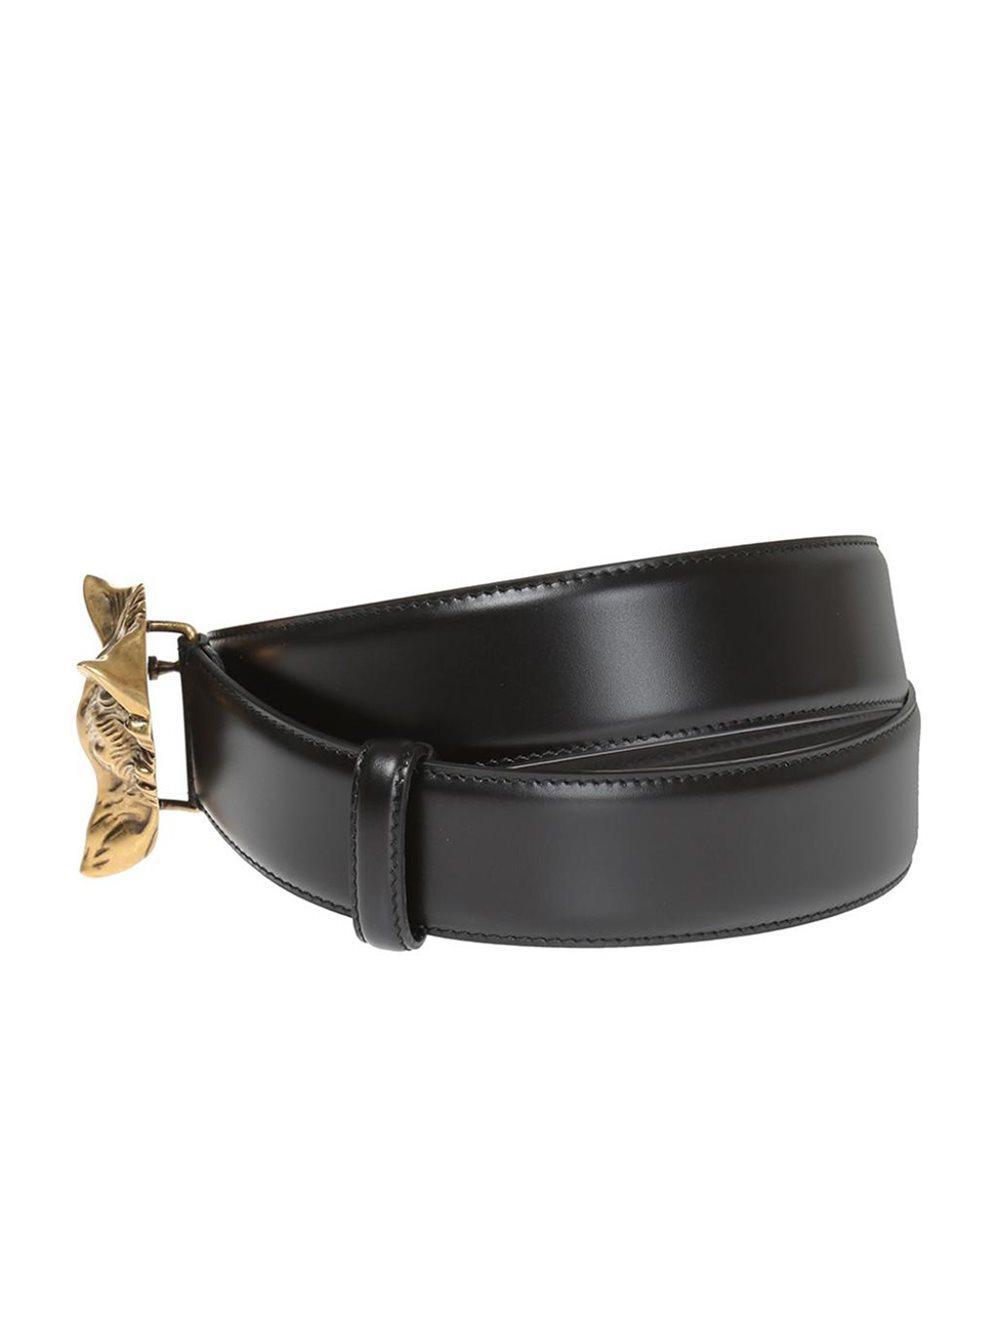 34f21896a89 Lyst - Gucci Wolf Head Belt in Black for Men